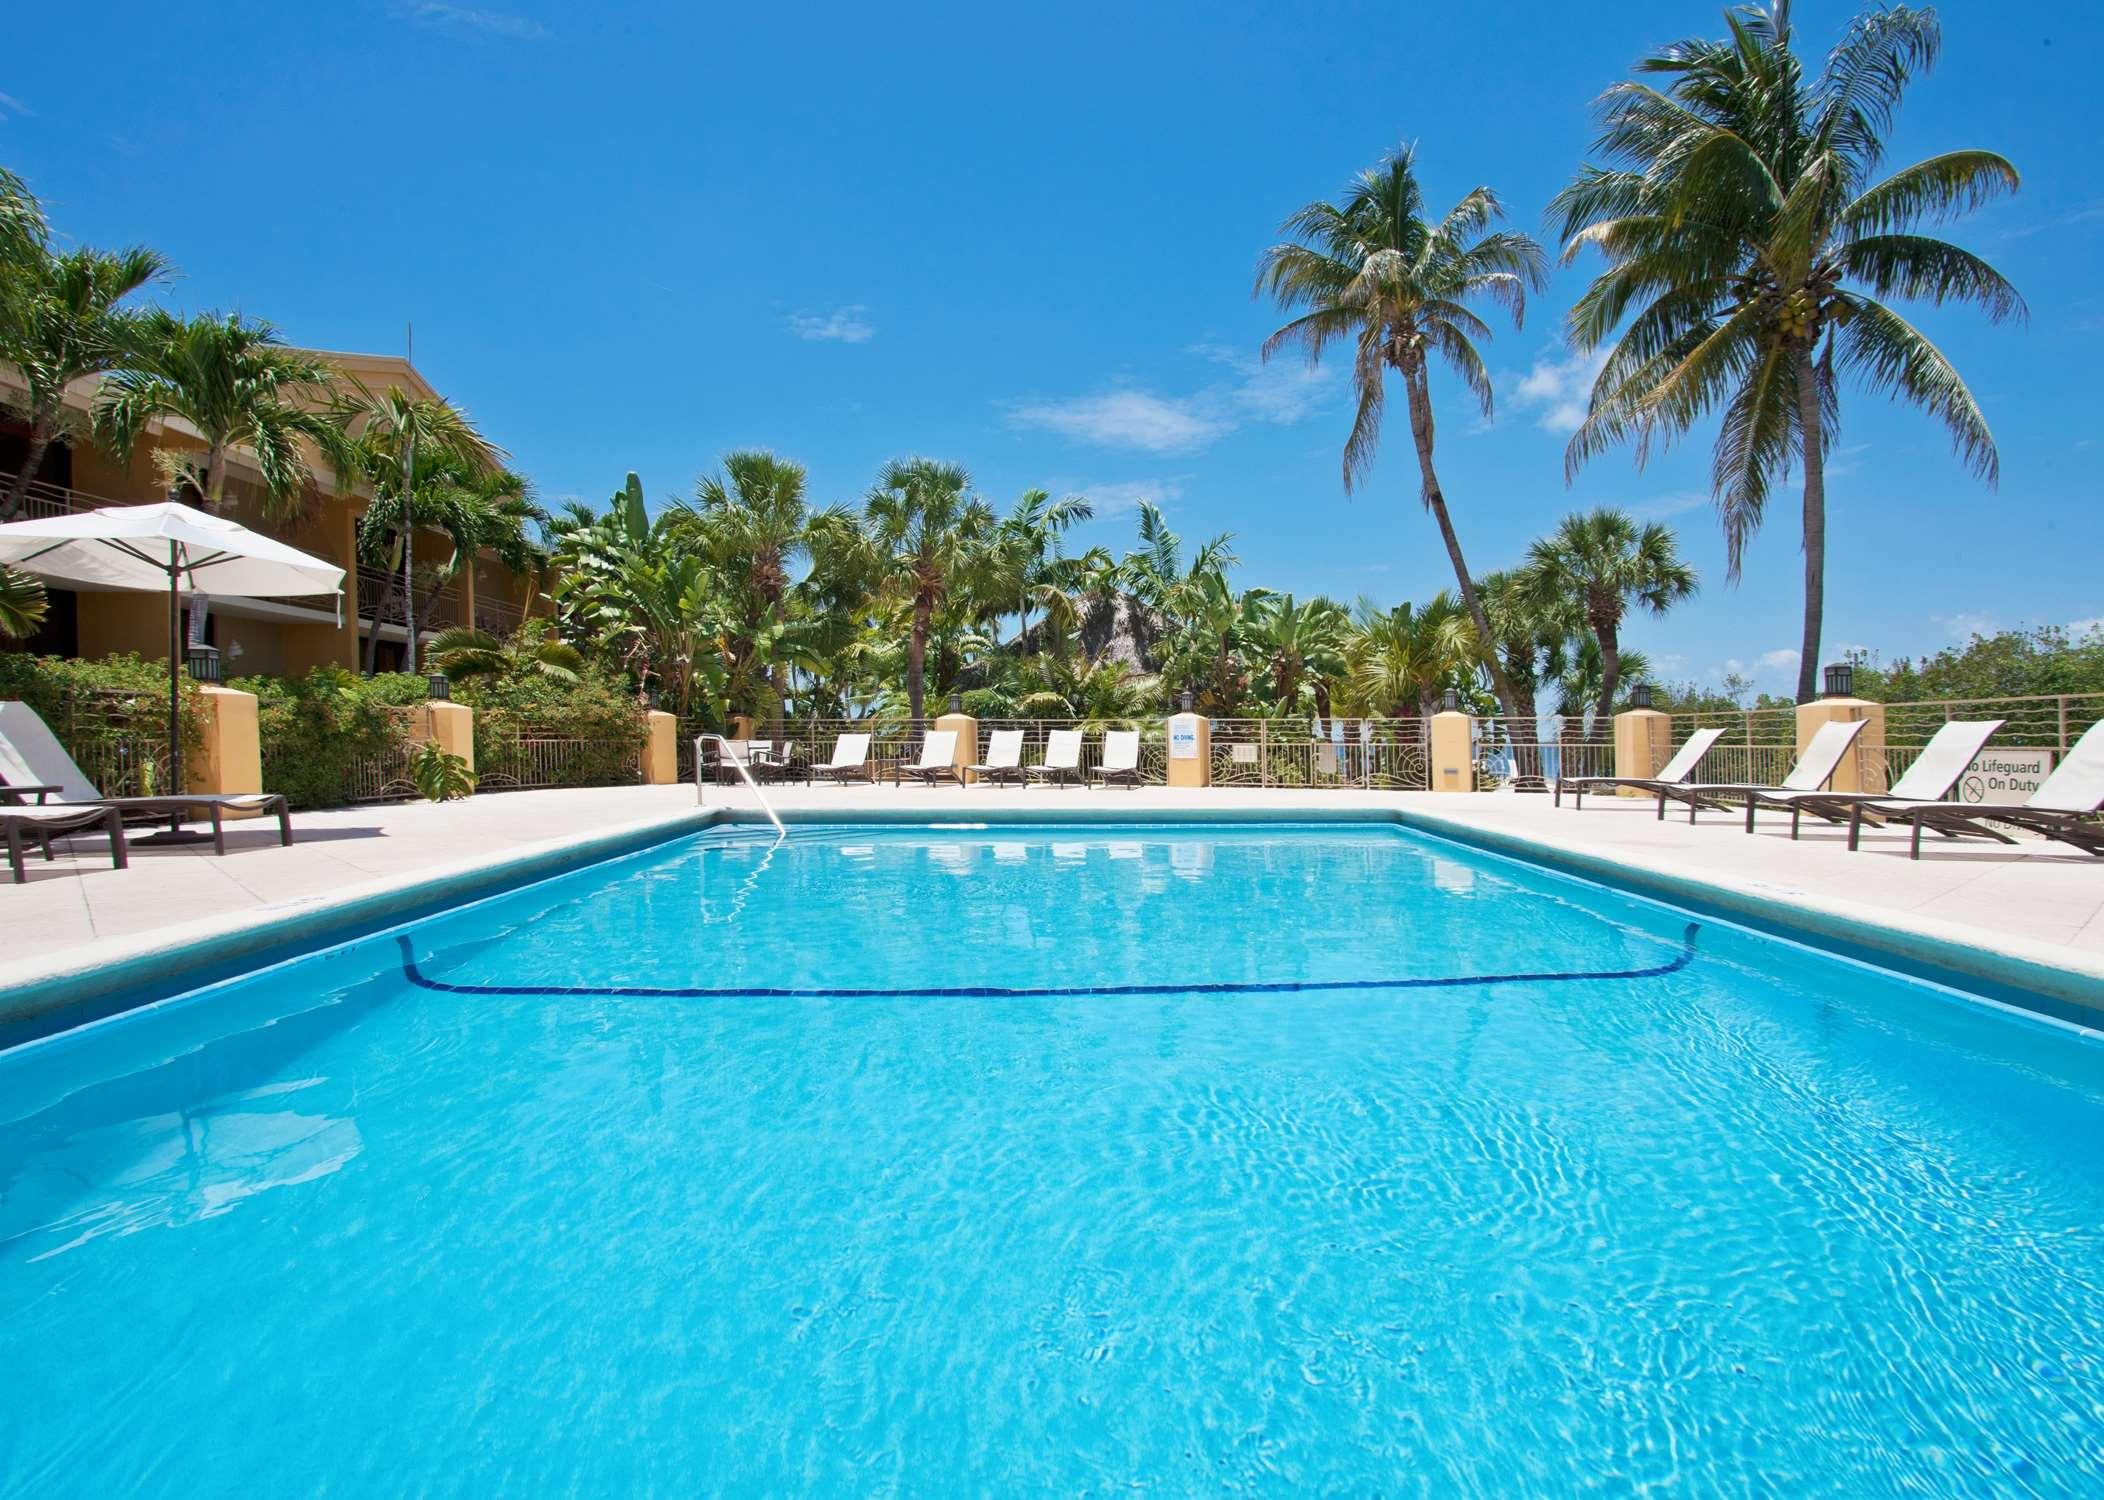 Hampton Inn Key Largo, FL image 14